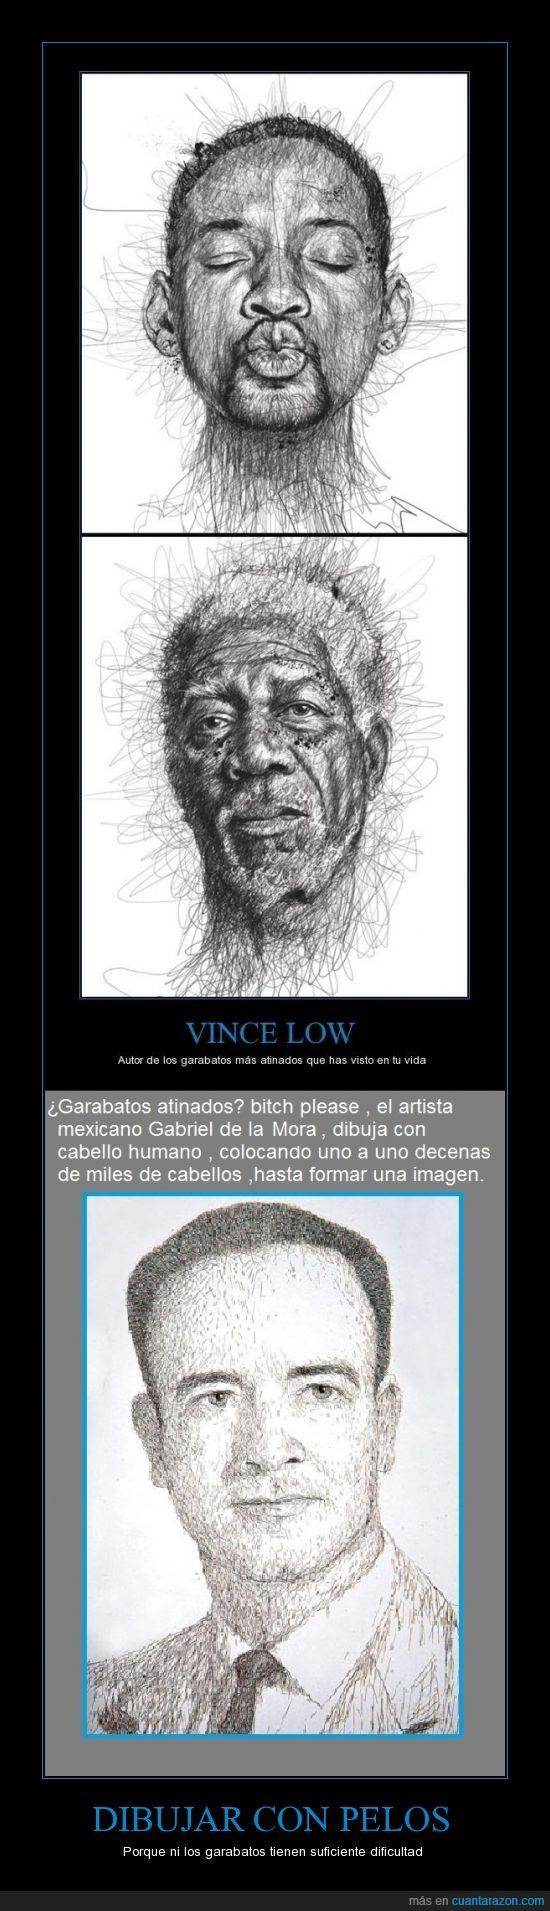 artista,cabello,dibujar,Gabriel de la mora,imagen,mexico,pelo,Vince Low